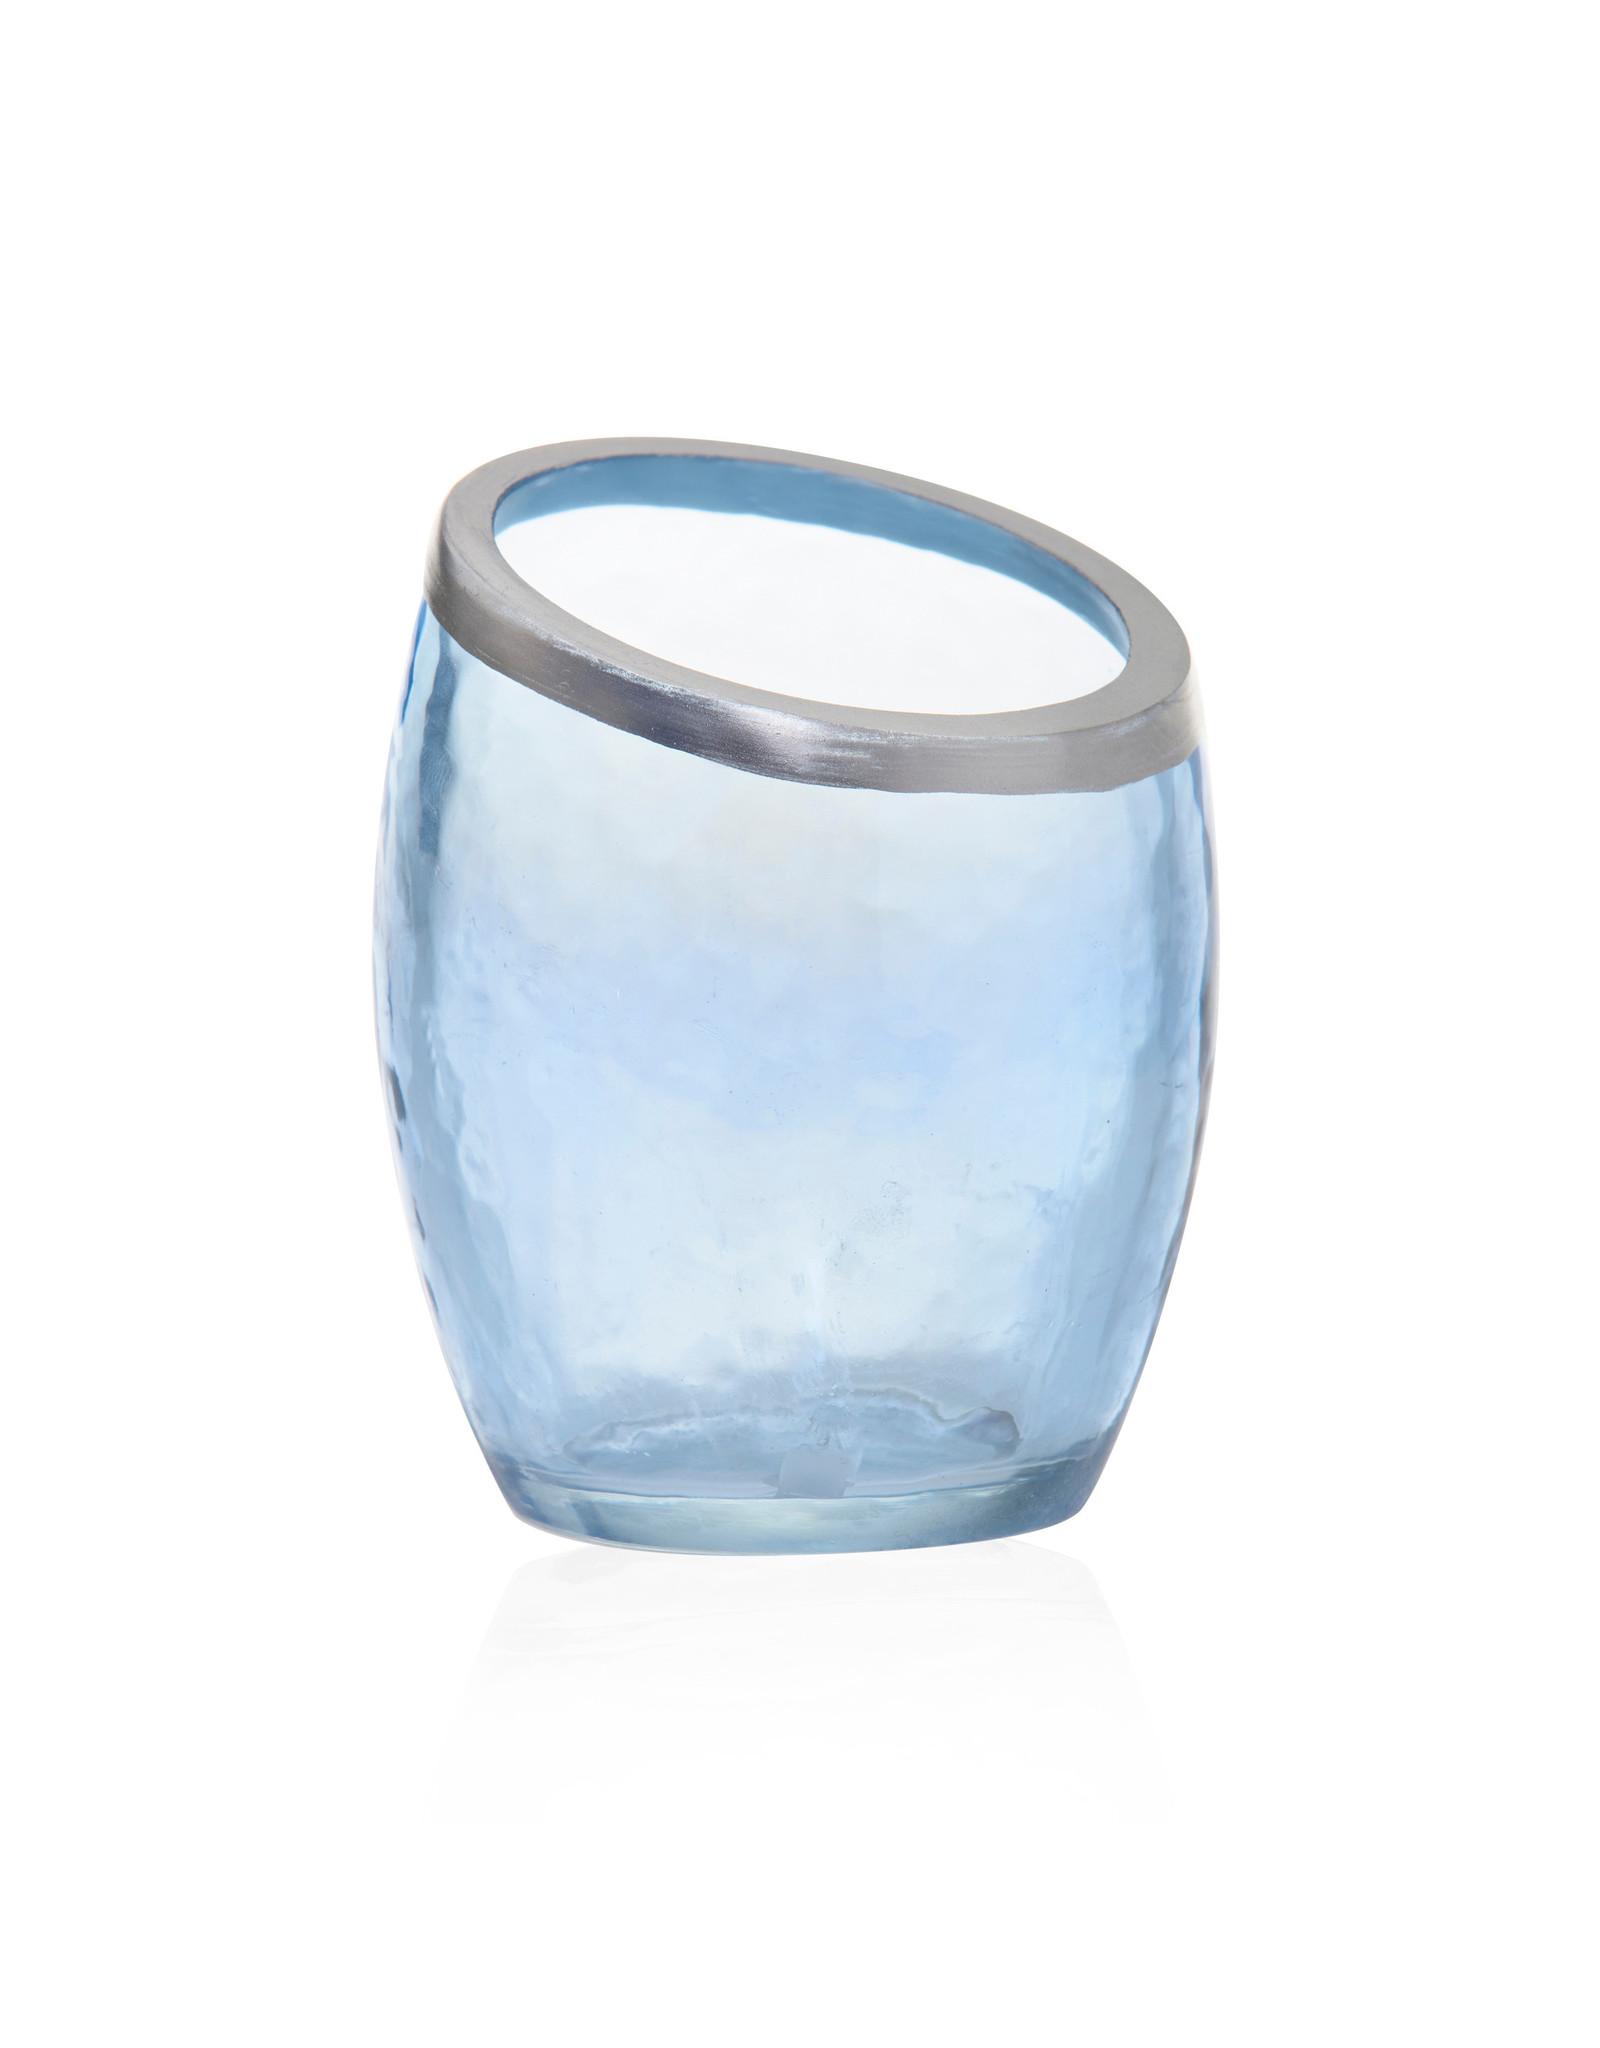 Yankee Candle Pearlescent Blue Votive Holder